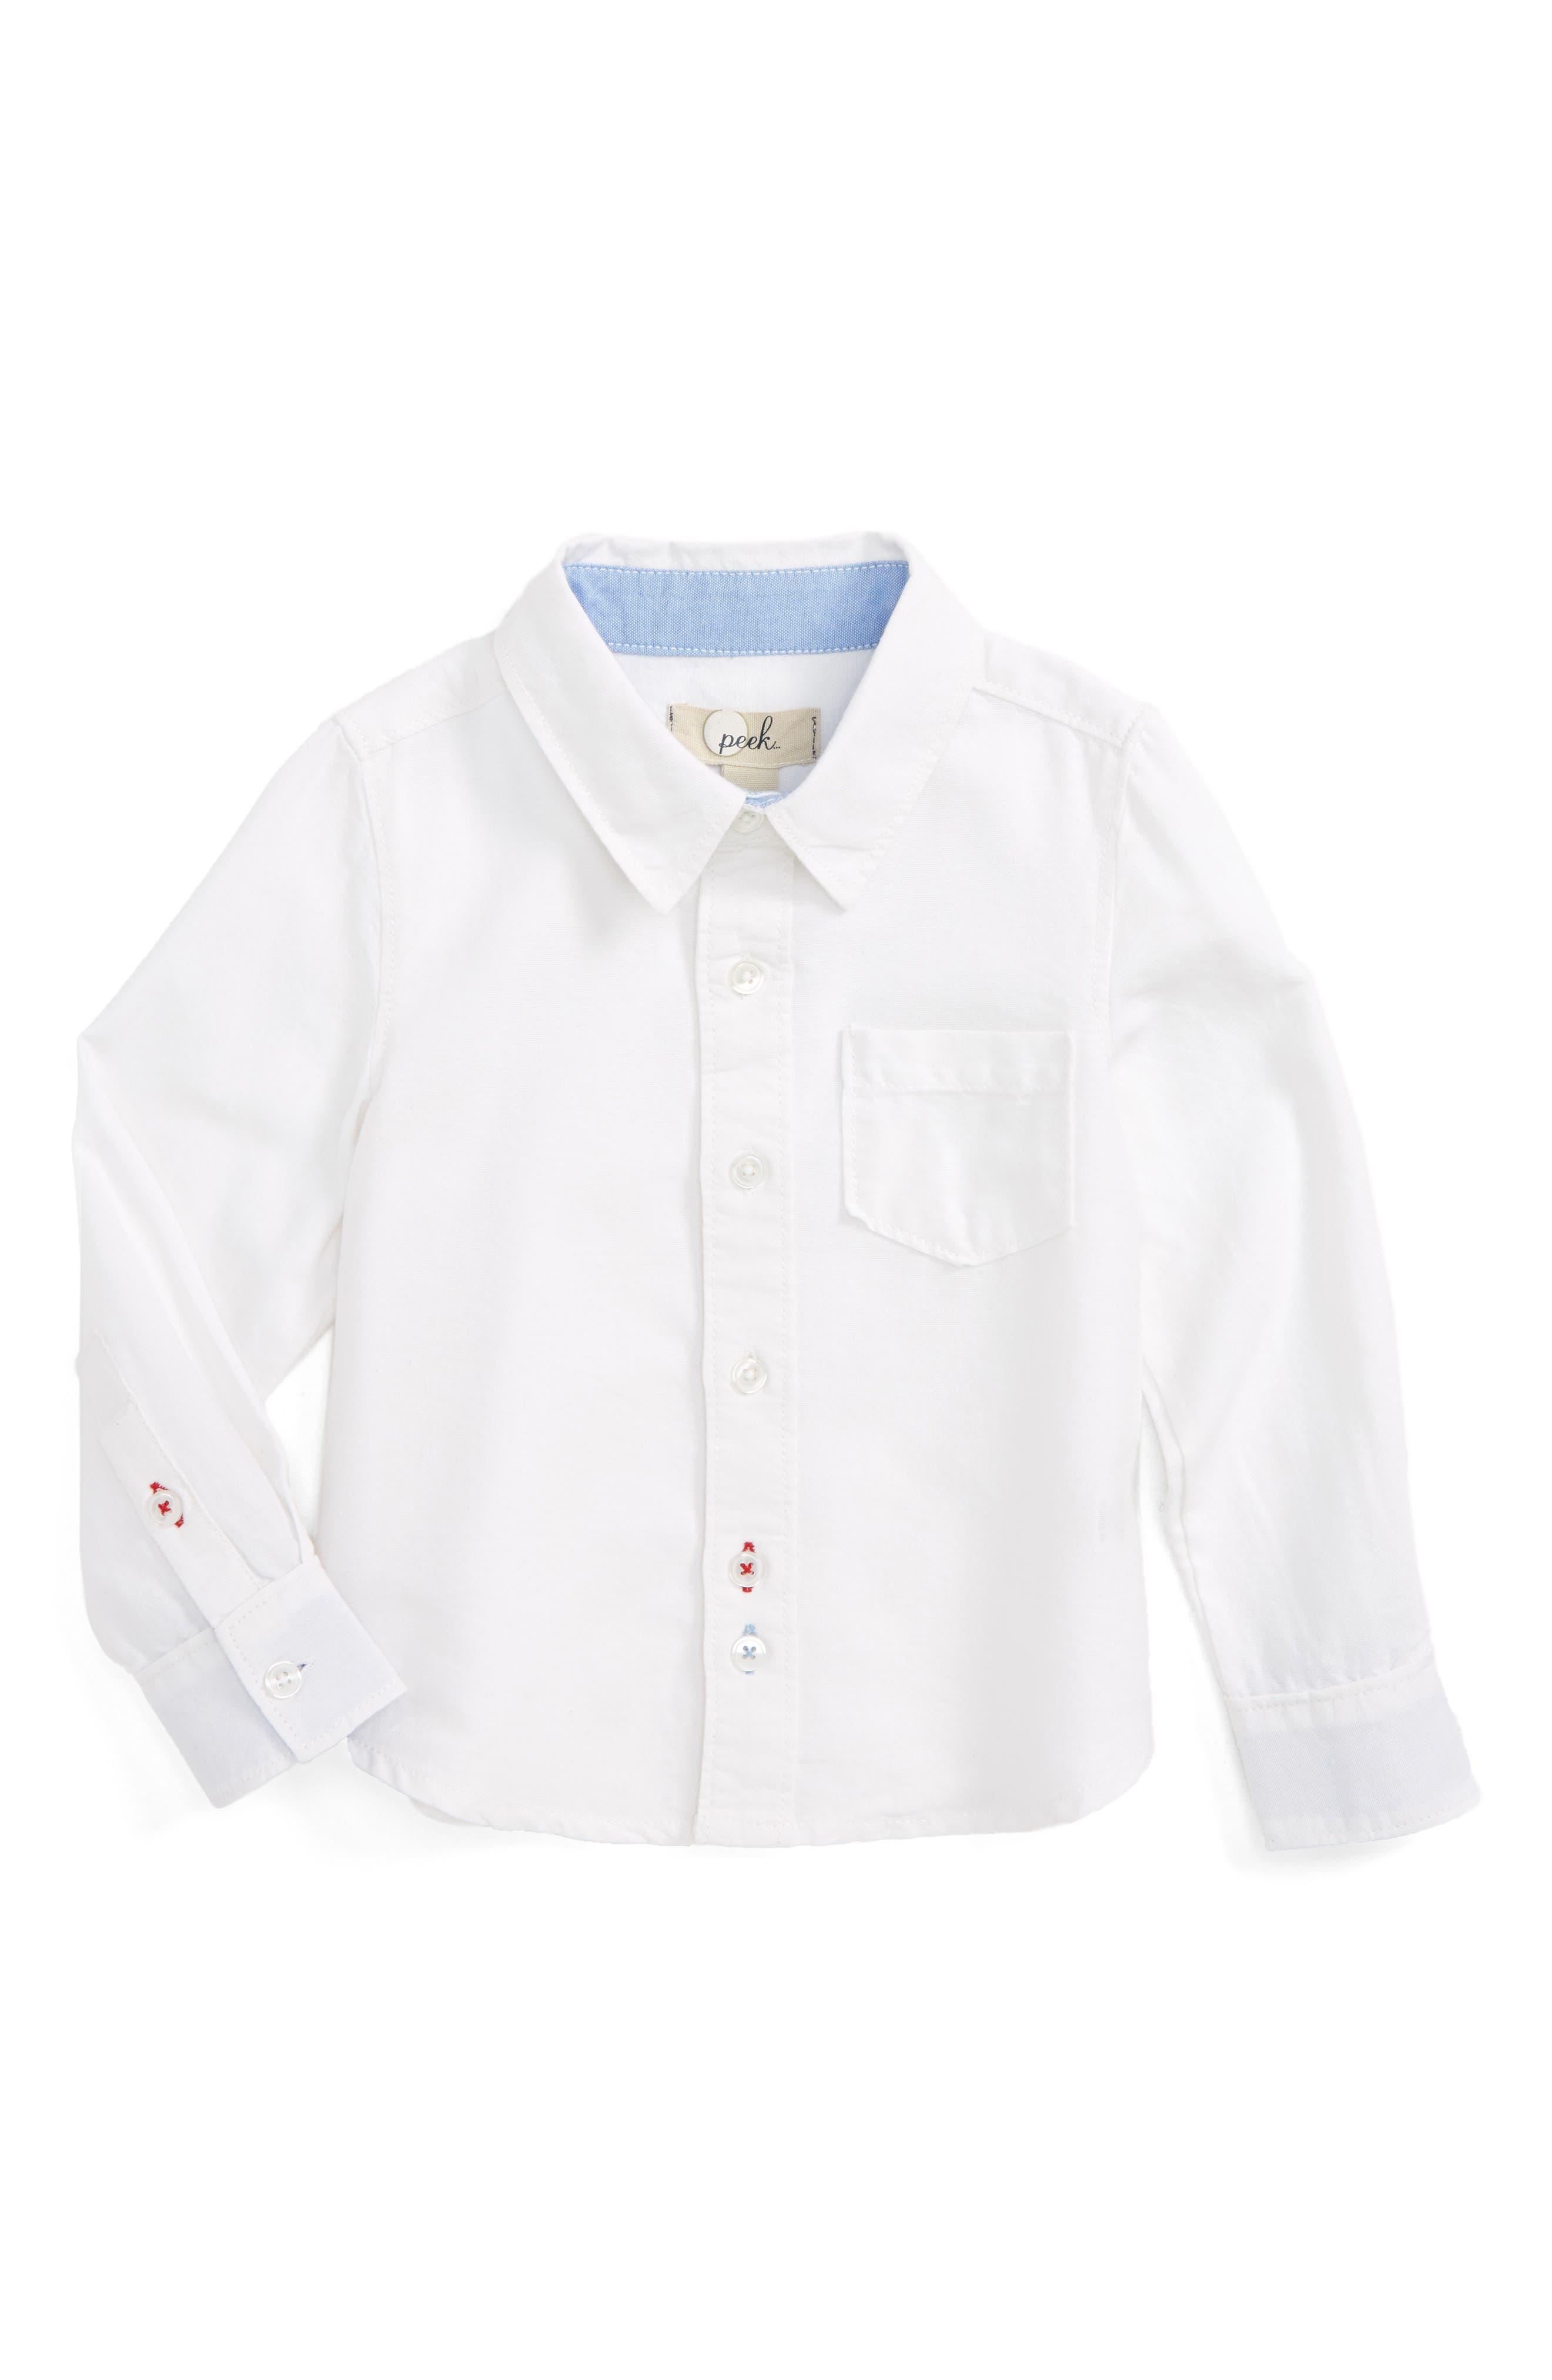 Thomas Oxford Shirt,                             Main thumbnail 1, color,                             White